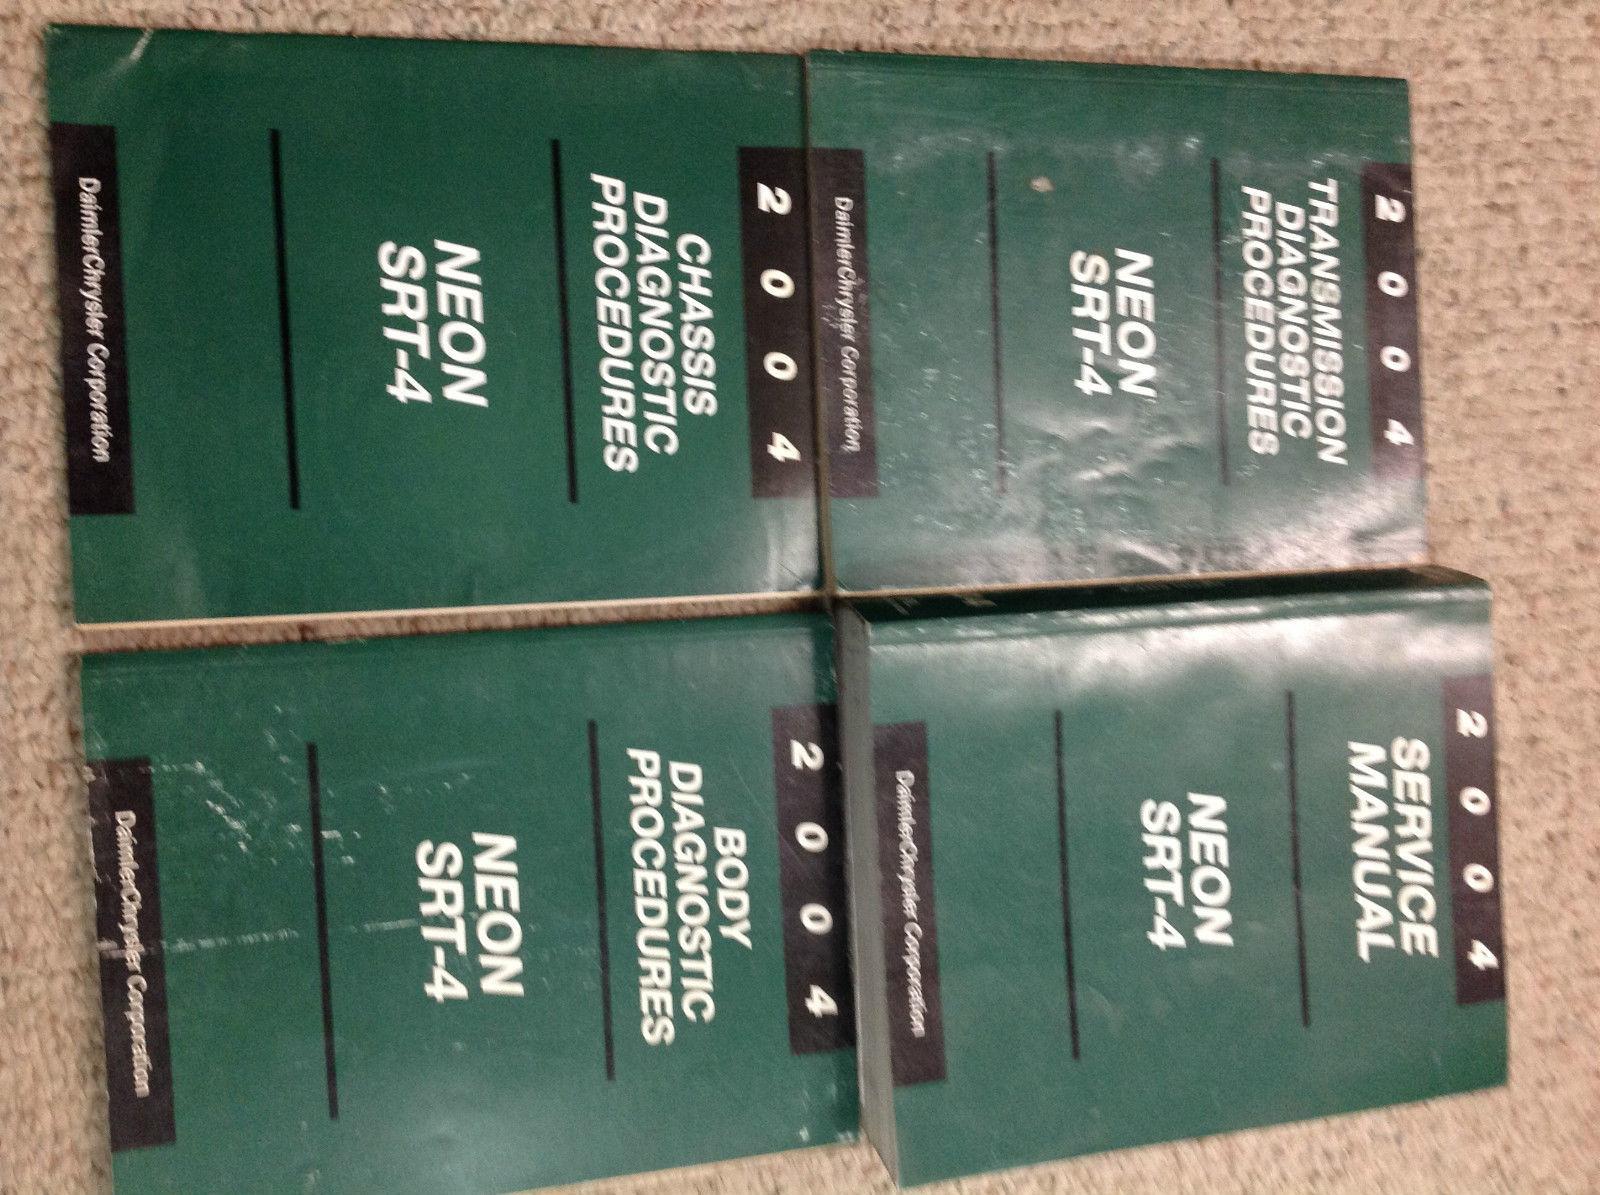 1997 DODGE NEON Service Repair Shop Manual SET W BODY /& CHASSIS DIAGNOSTIC BOOKS